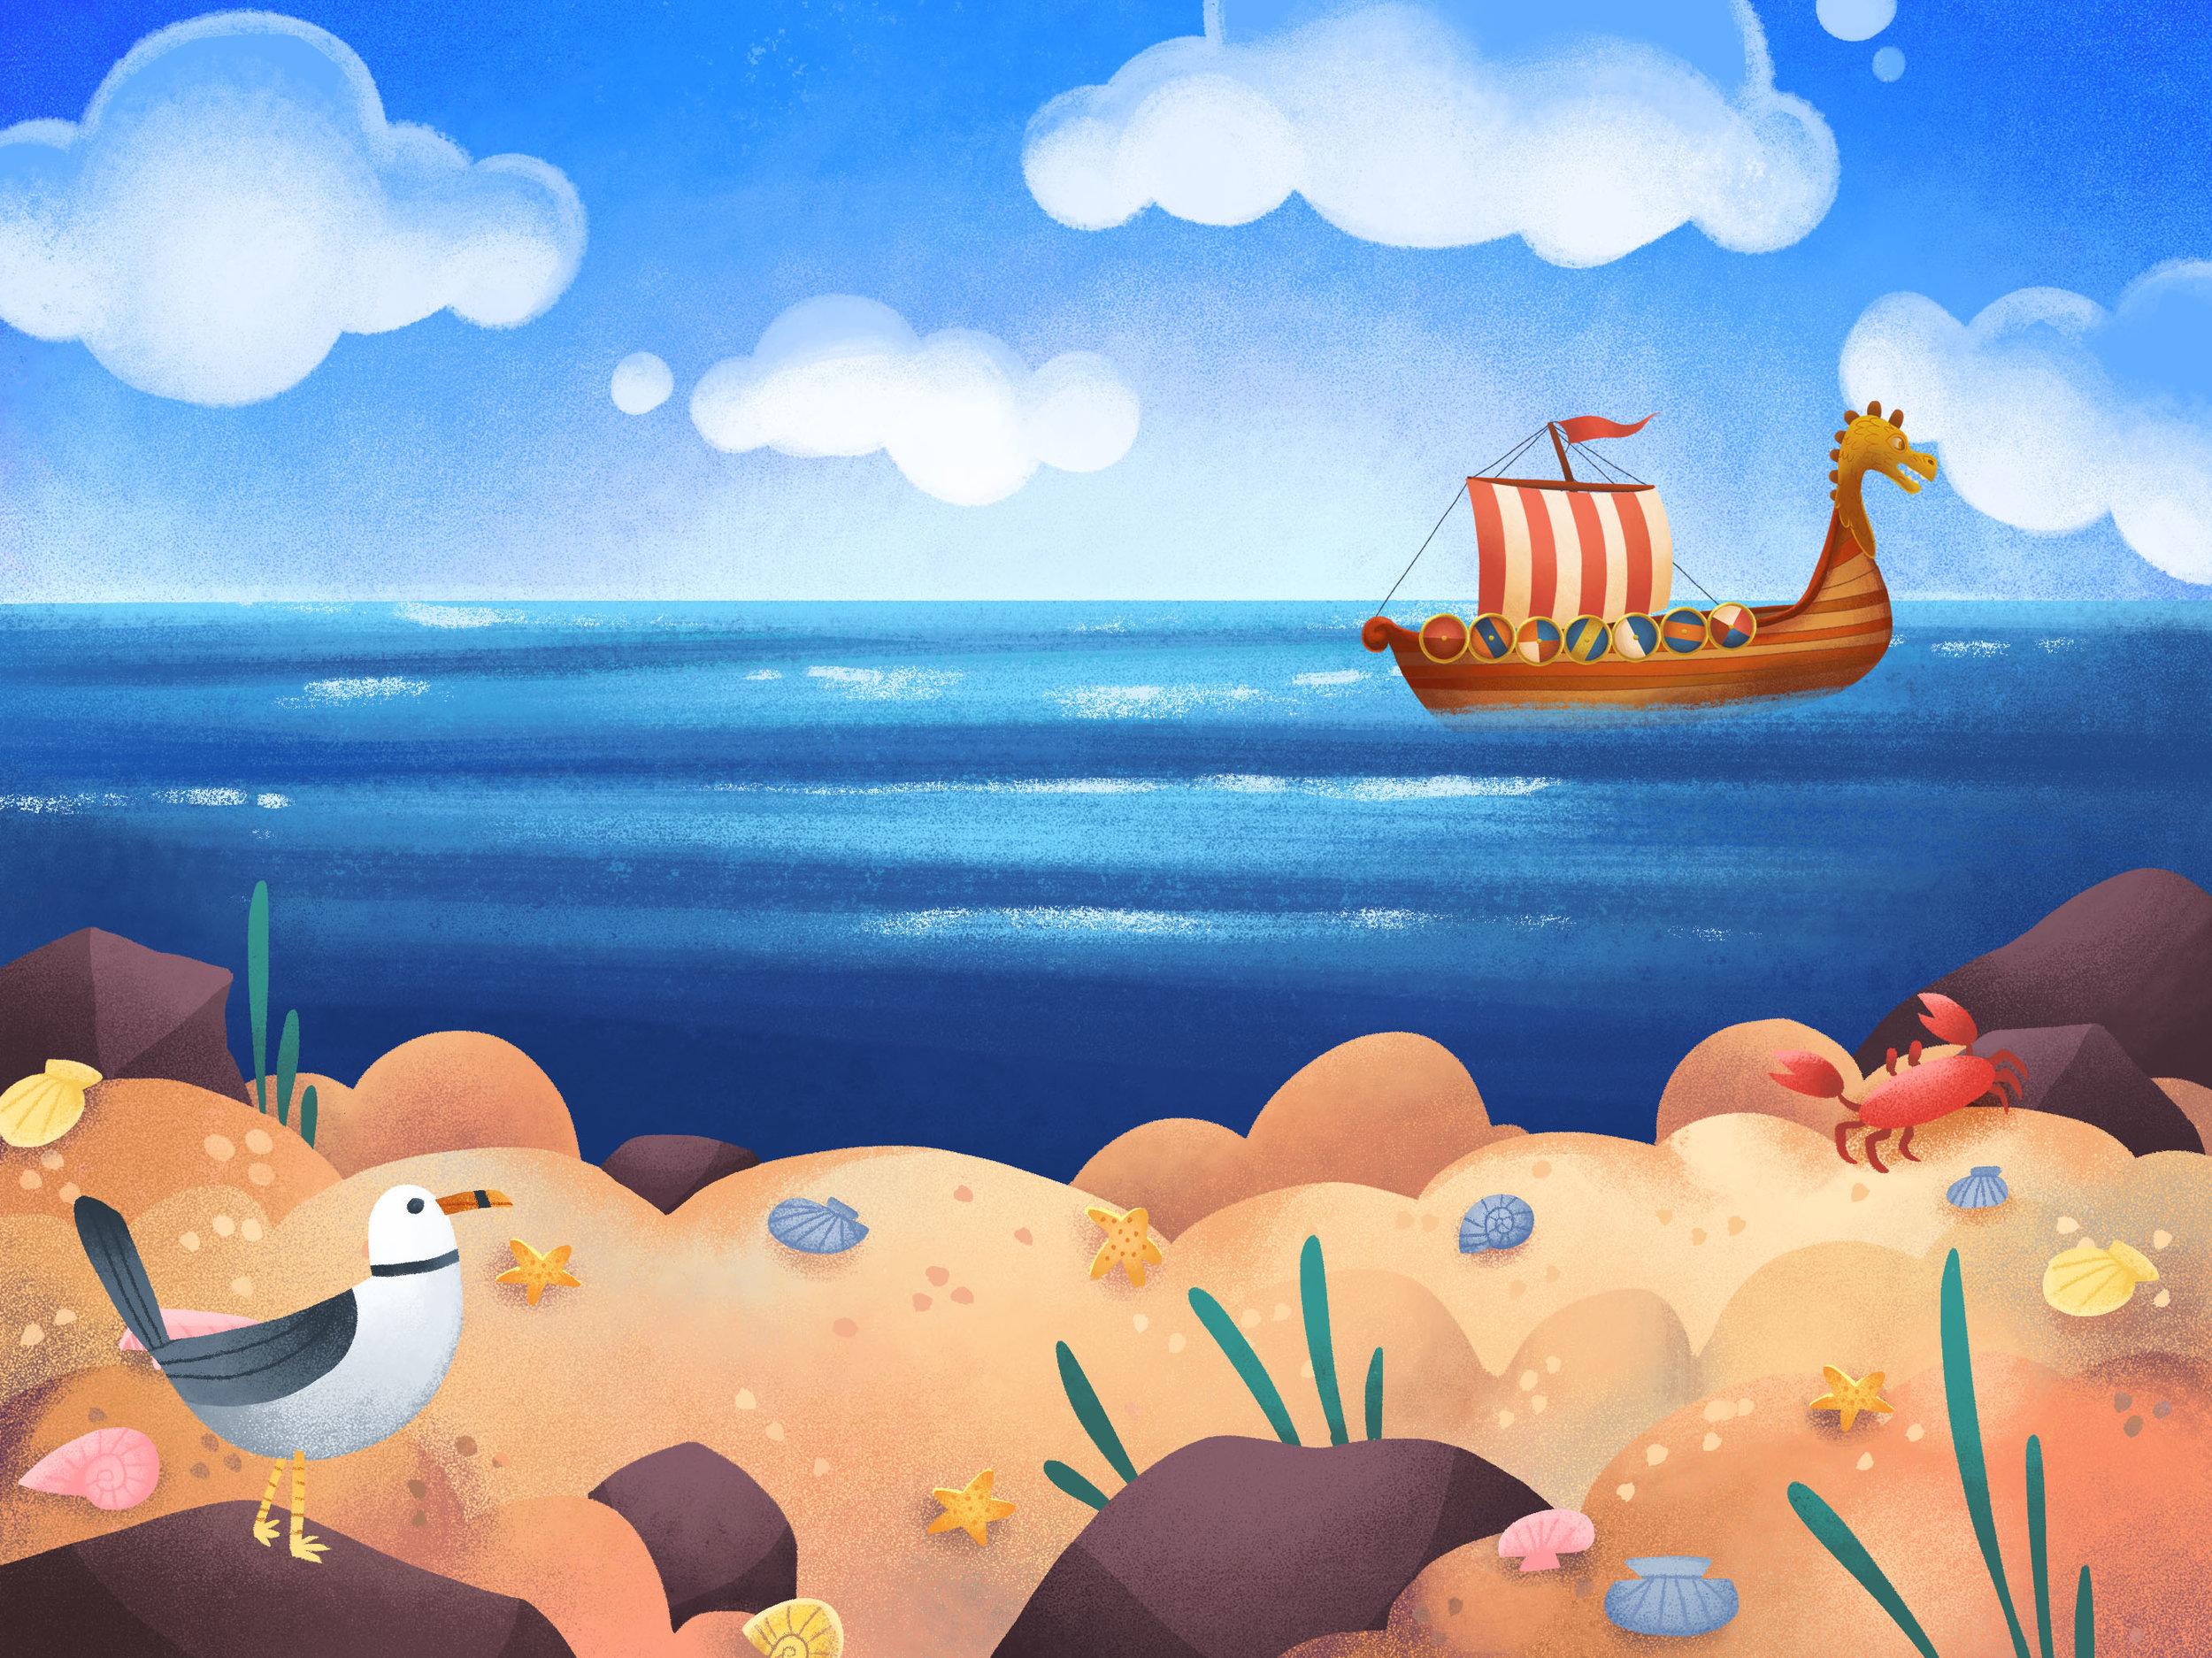 viking_0004_sails away.jpg